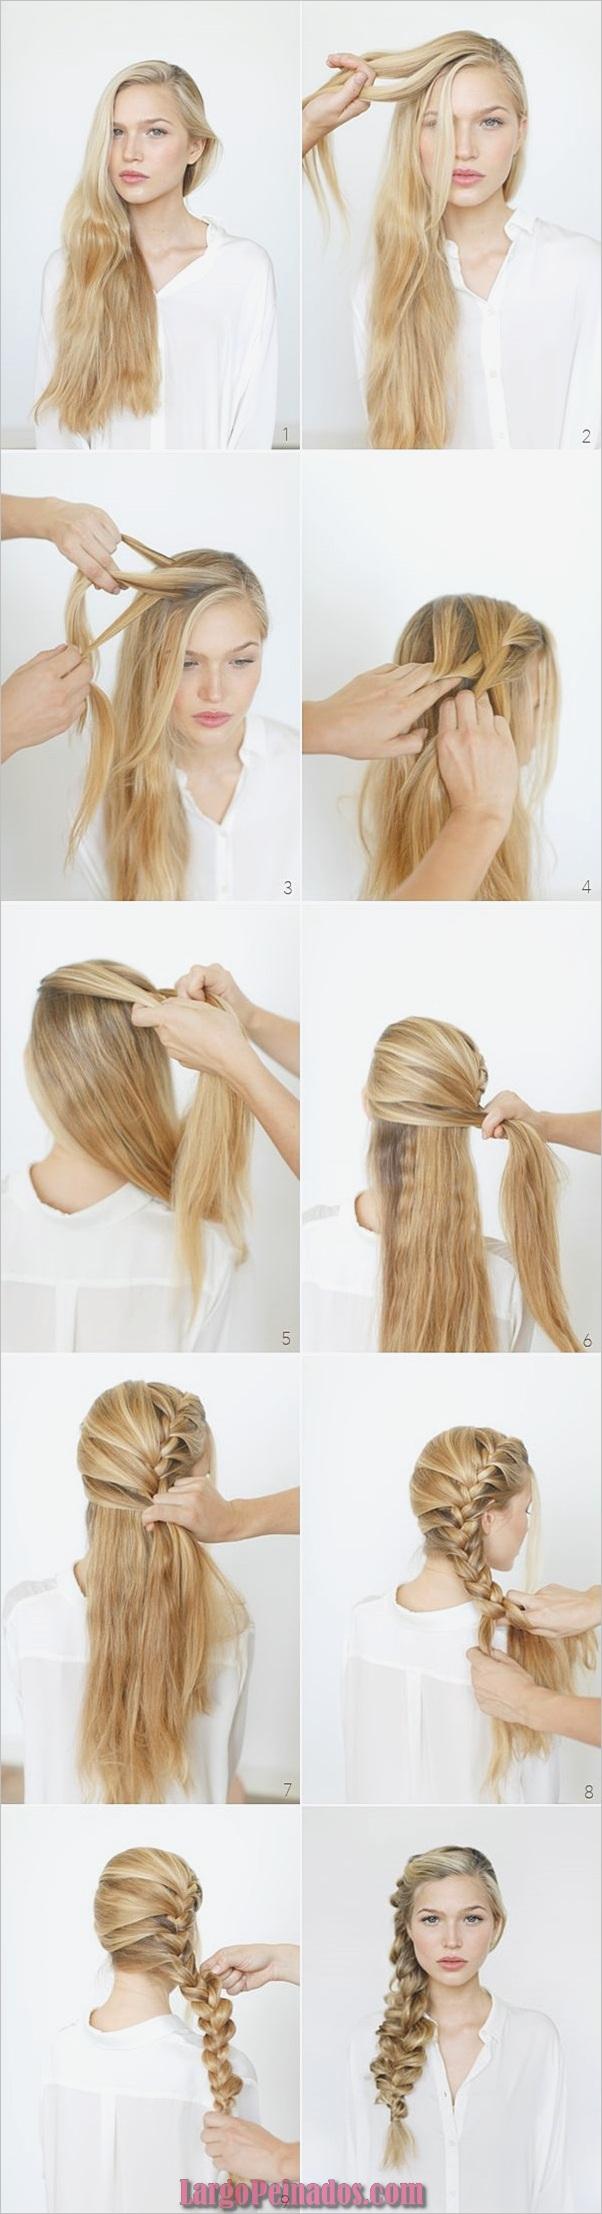 Peinados simples de cinco minutos (10)